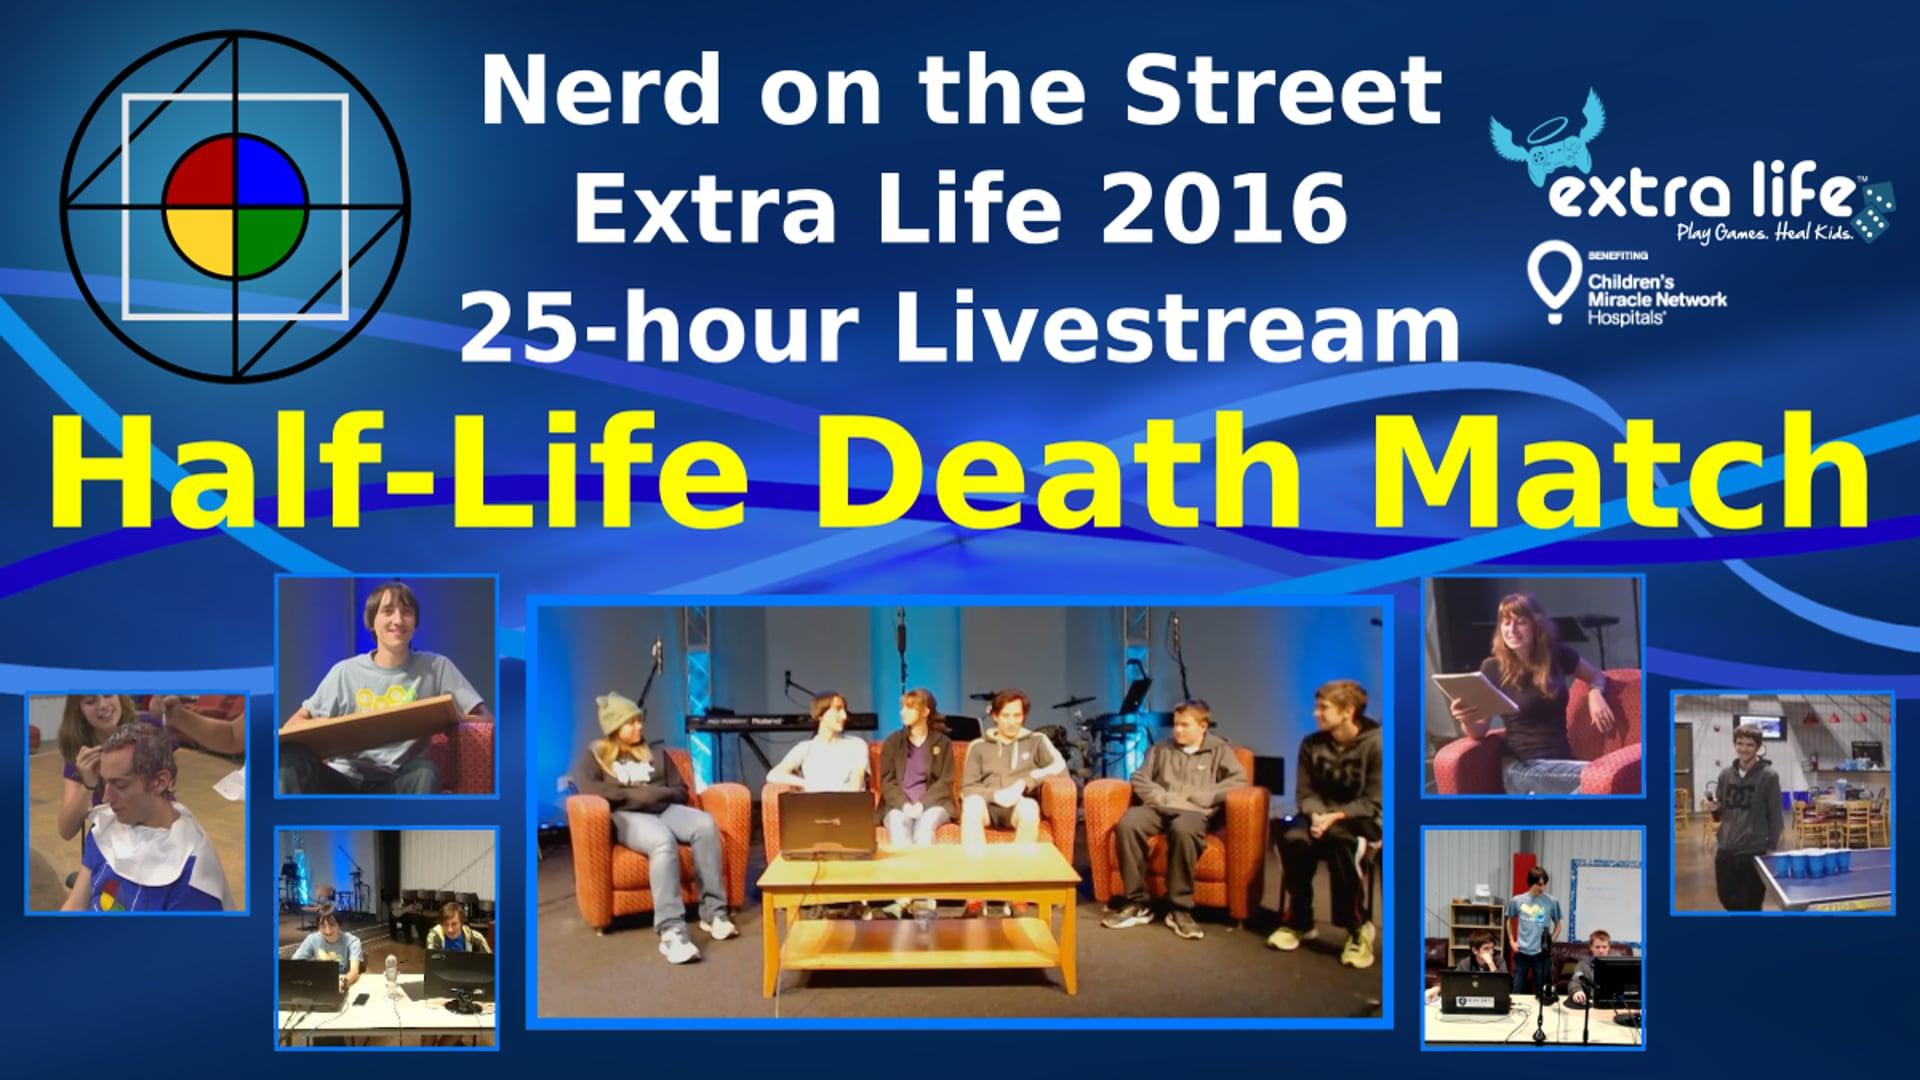 Half-Life Death Match - Extra Life 2016